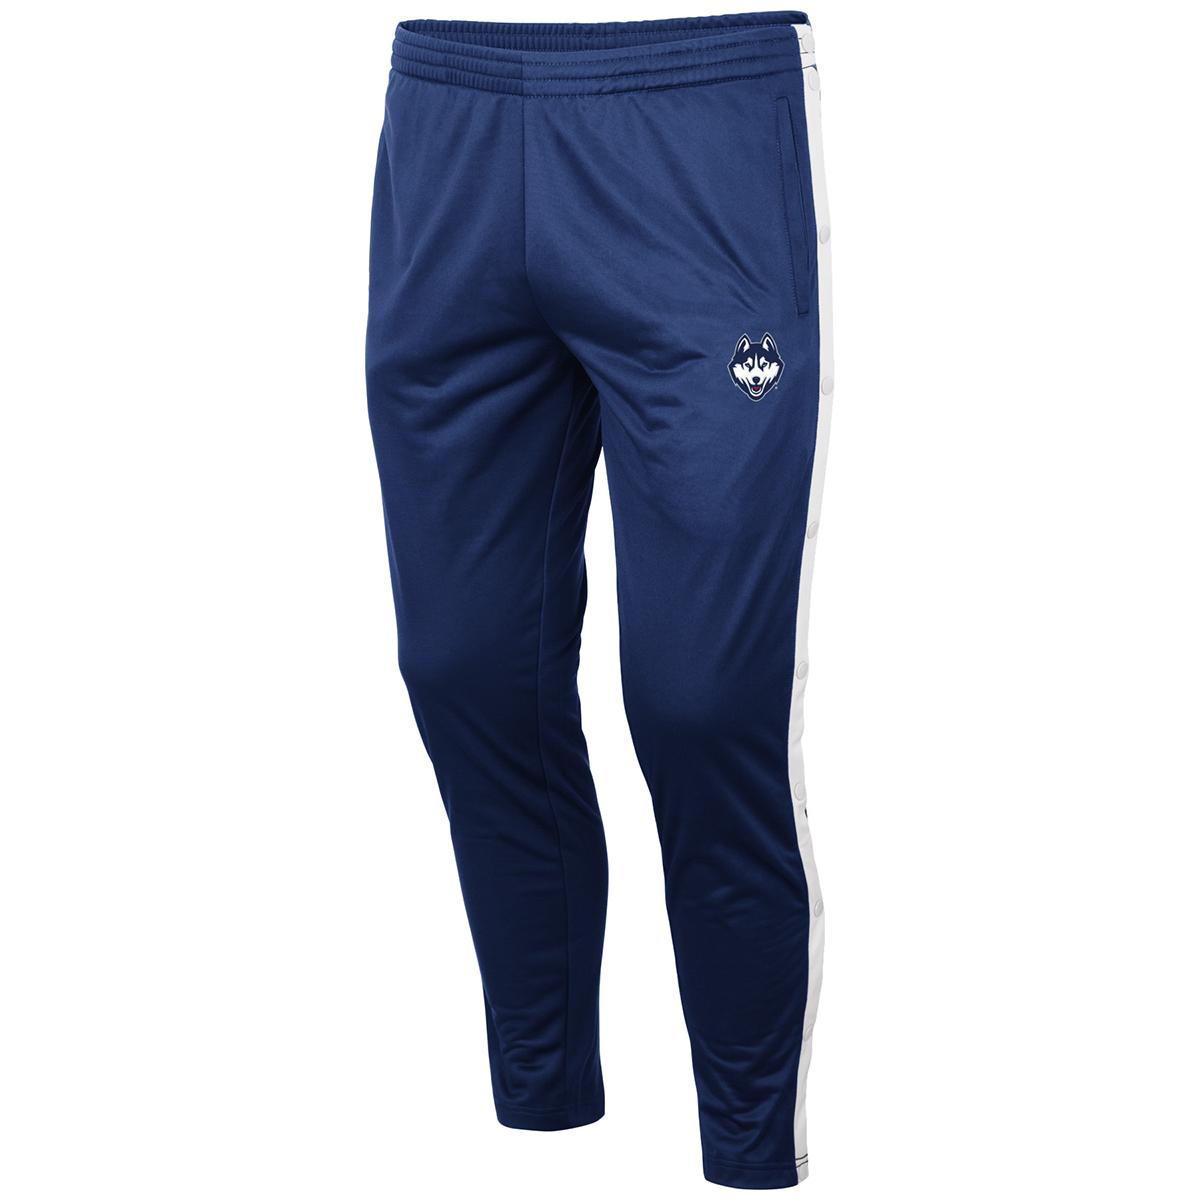 Uconn Men's Disco Stu Track Pants - Blue, M